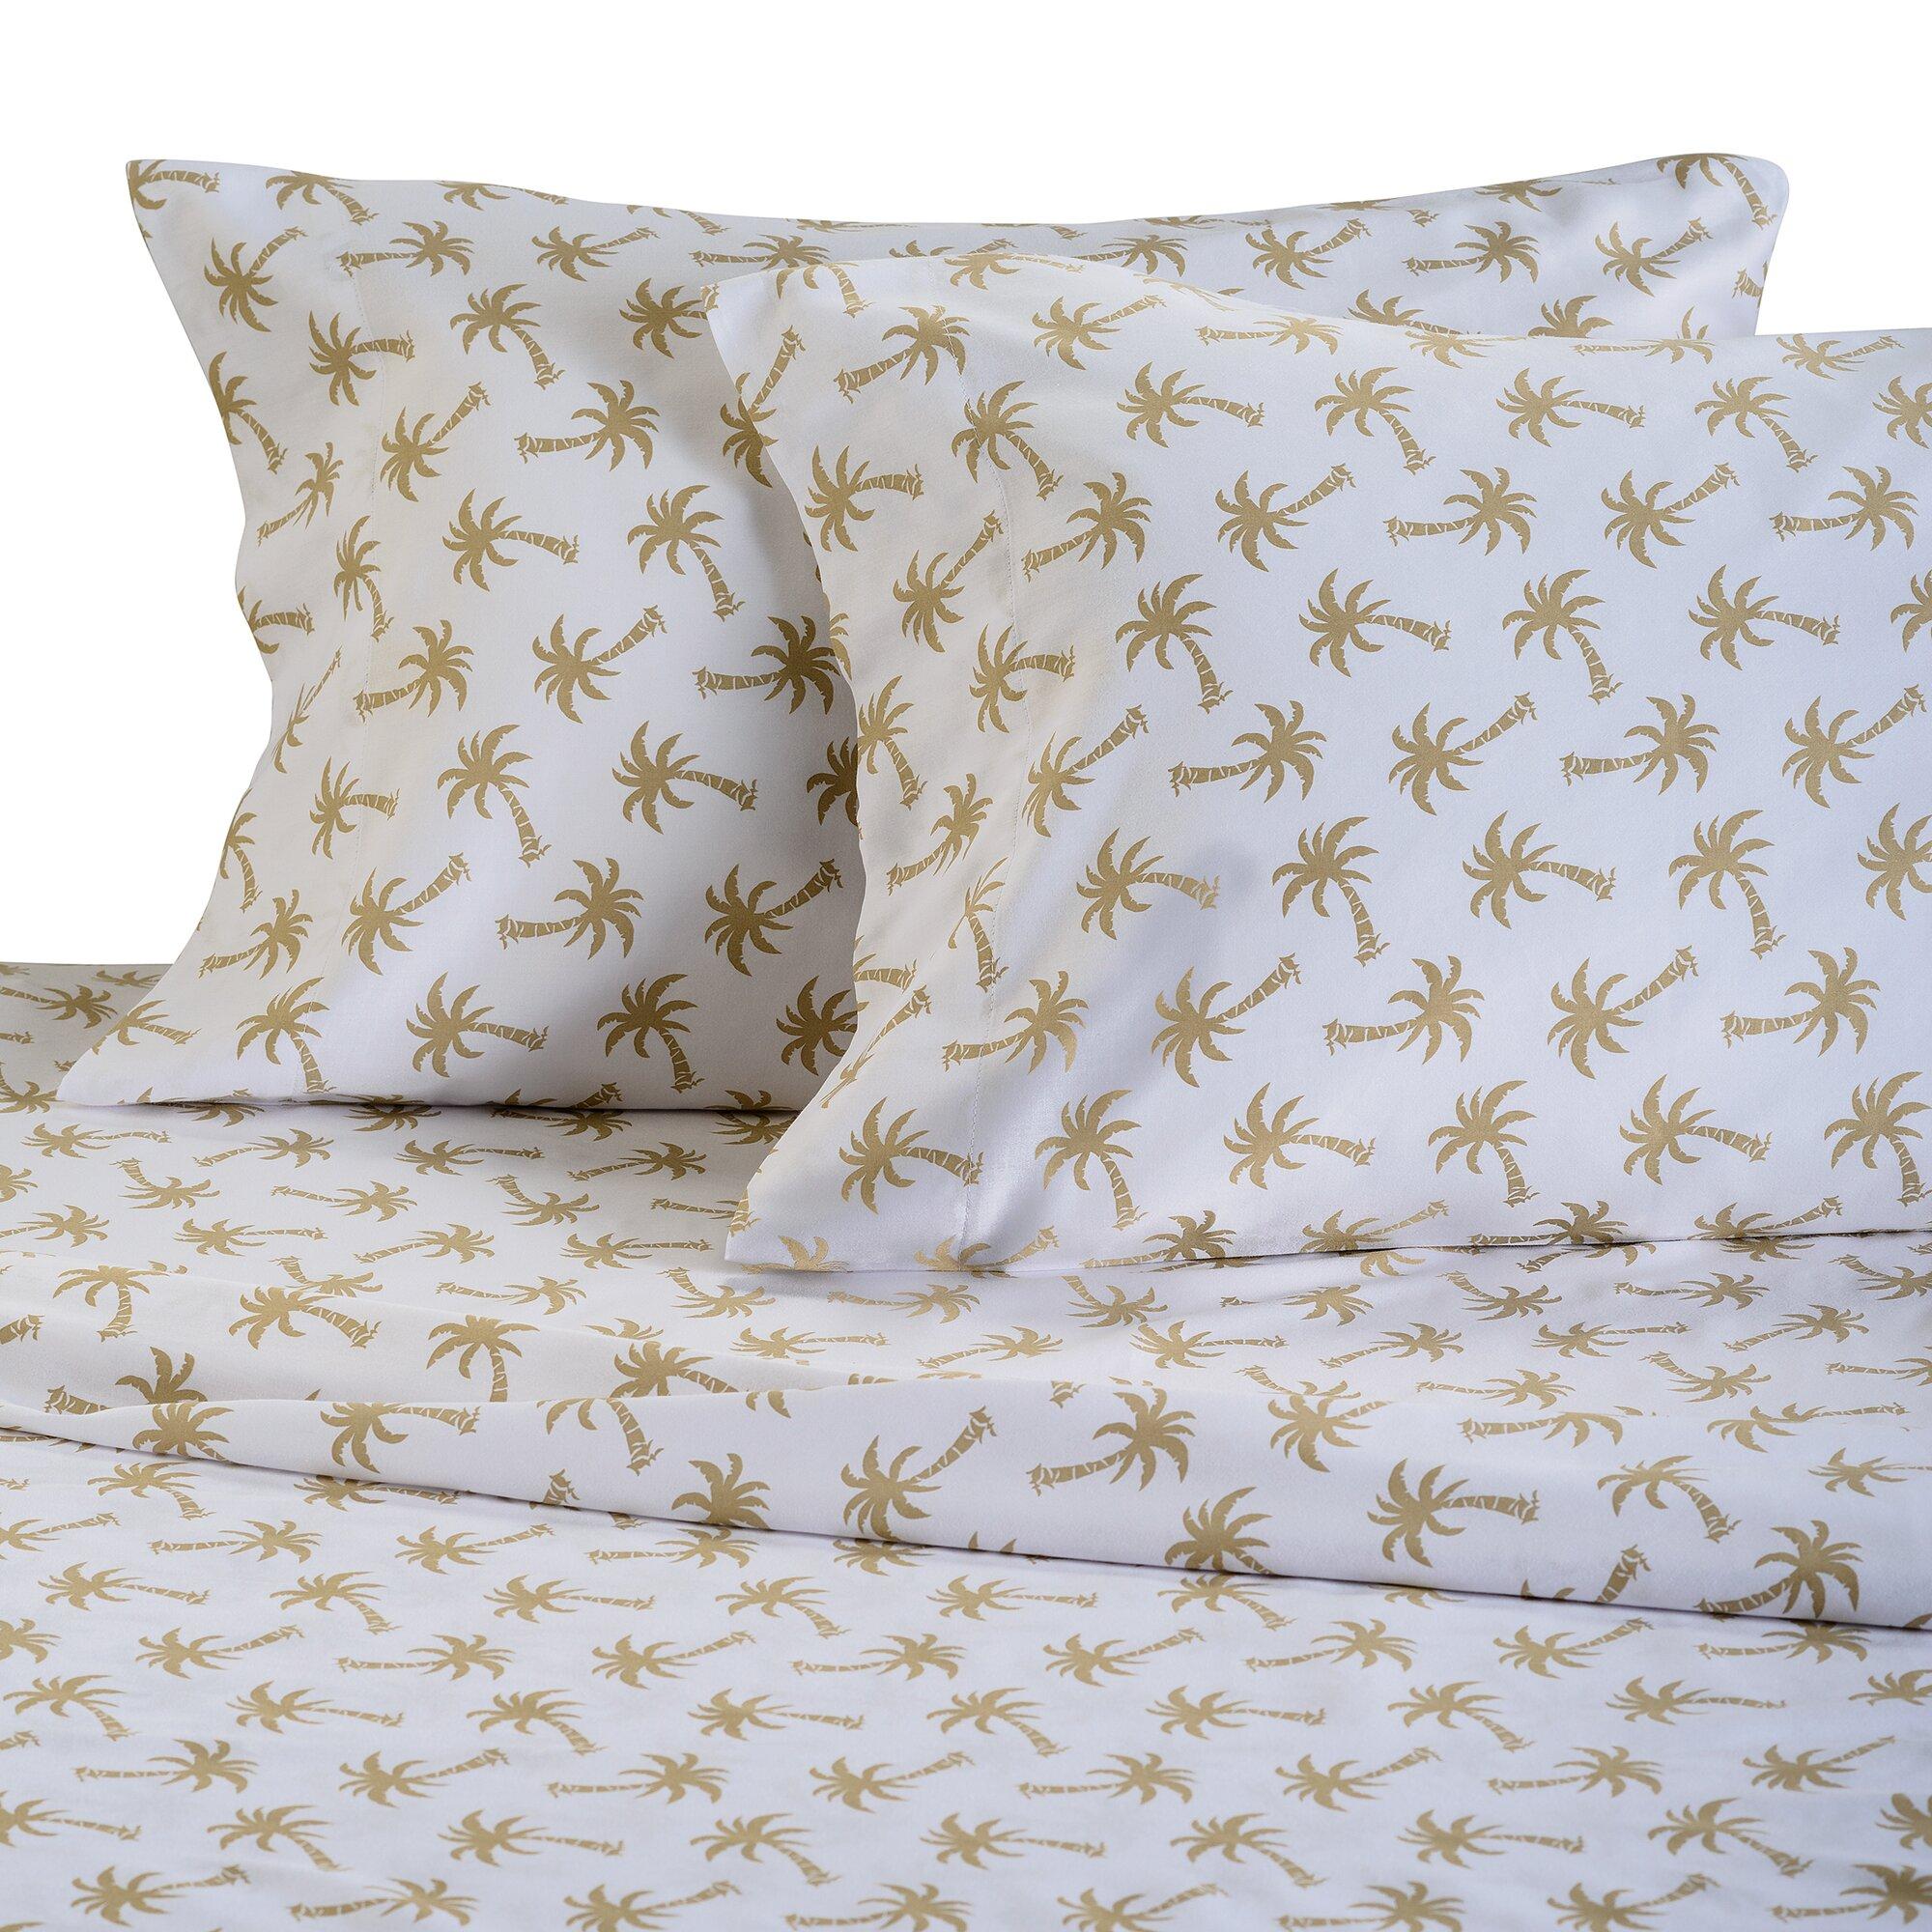 Panama Jack Palm Beach 300 Thread Count Cotton Sheet Set